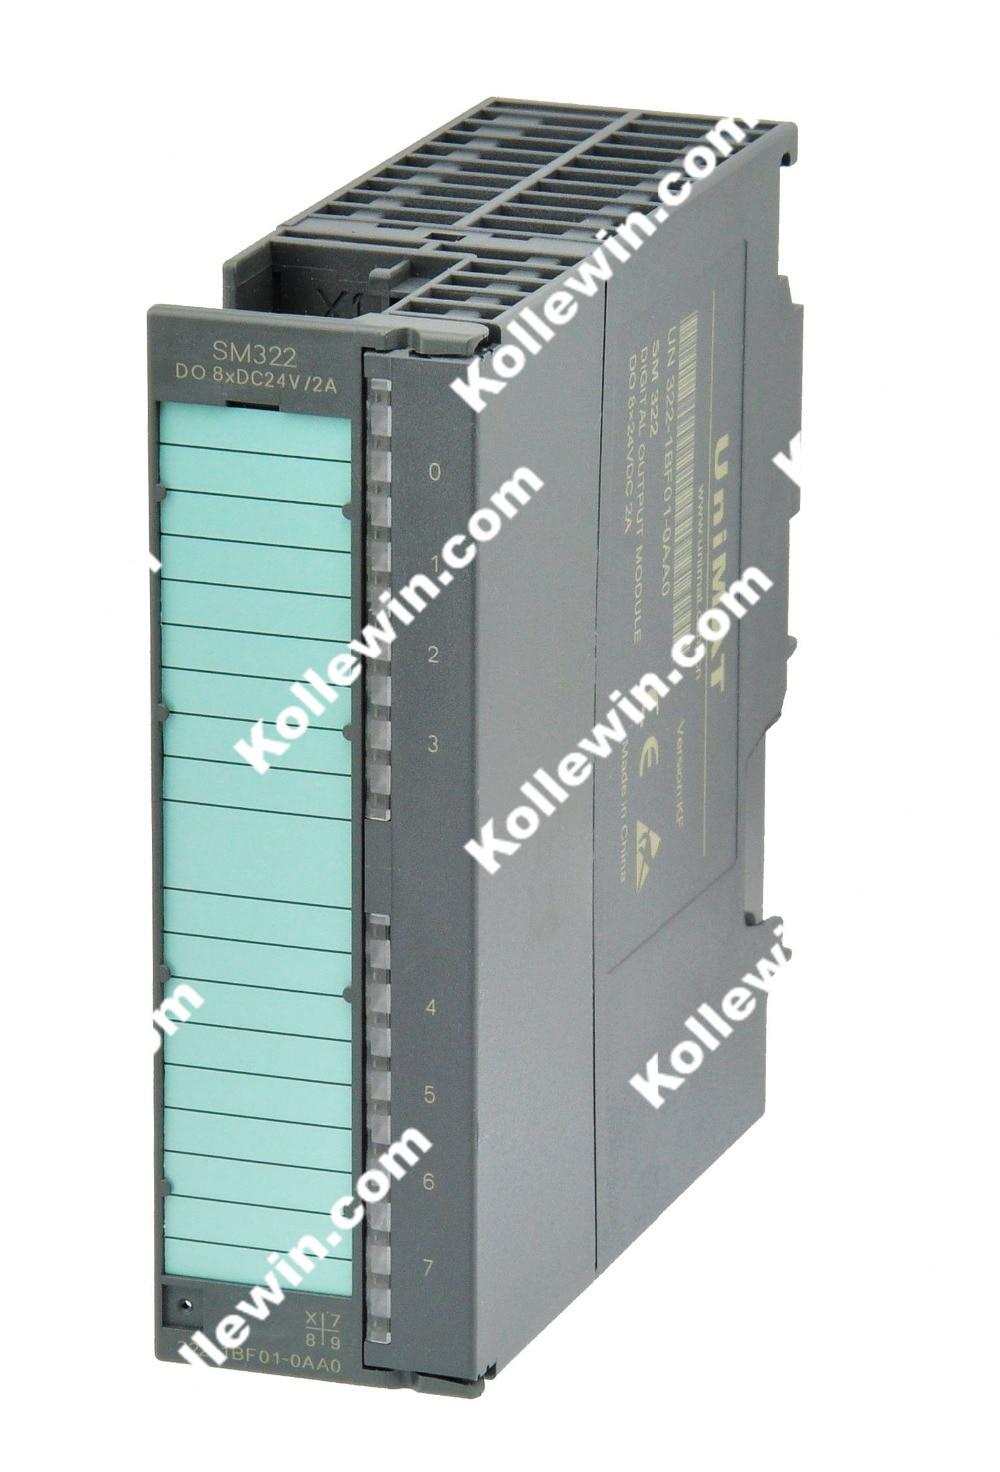 FreeShip Compatible 6ES7322-1BF01-0AA0 Module, SIMATIC S7-300, Digital Output SM 322, OEM 6ES7 322-1BF01-0AA0, 6ES73221BF010AA0 new original 6es7322 1hh01 0aa0 digital output module relay contacts 1 x 20 pin 6es7 322 1hh01 0aa0 simatic 6es73221hh010aa0